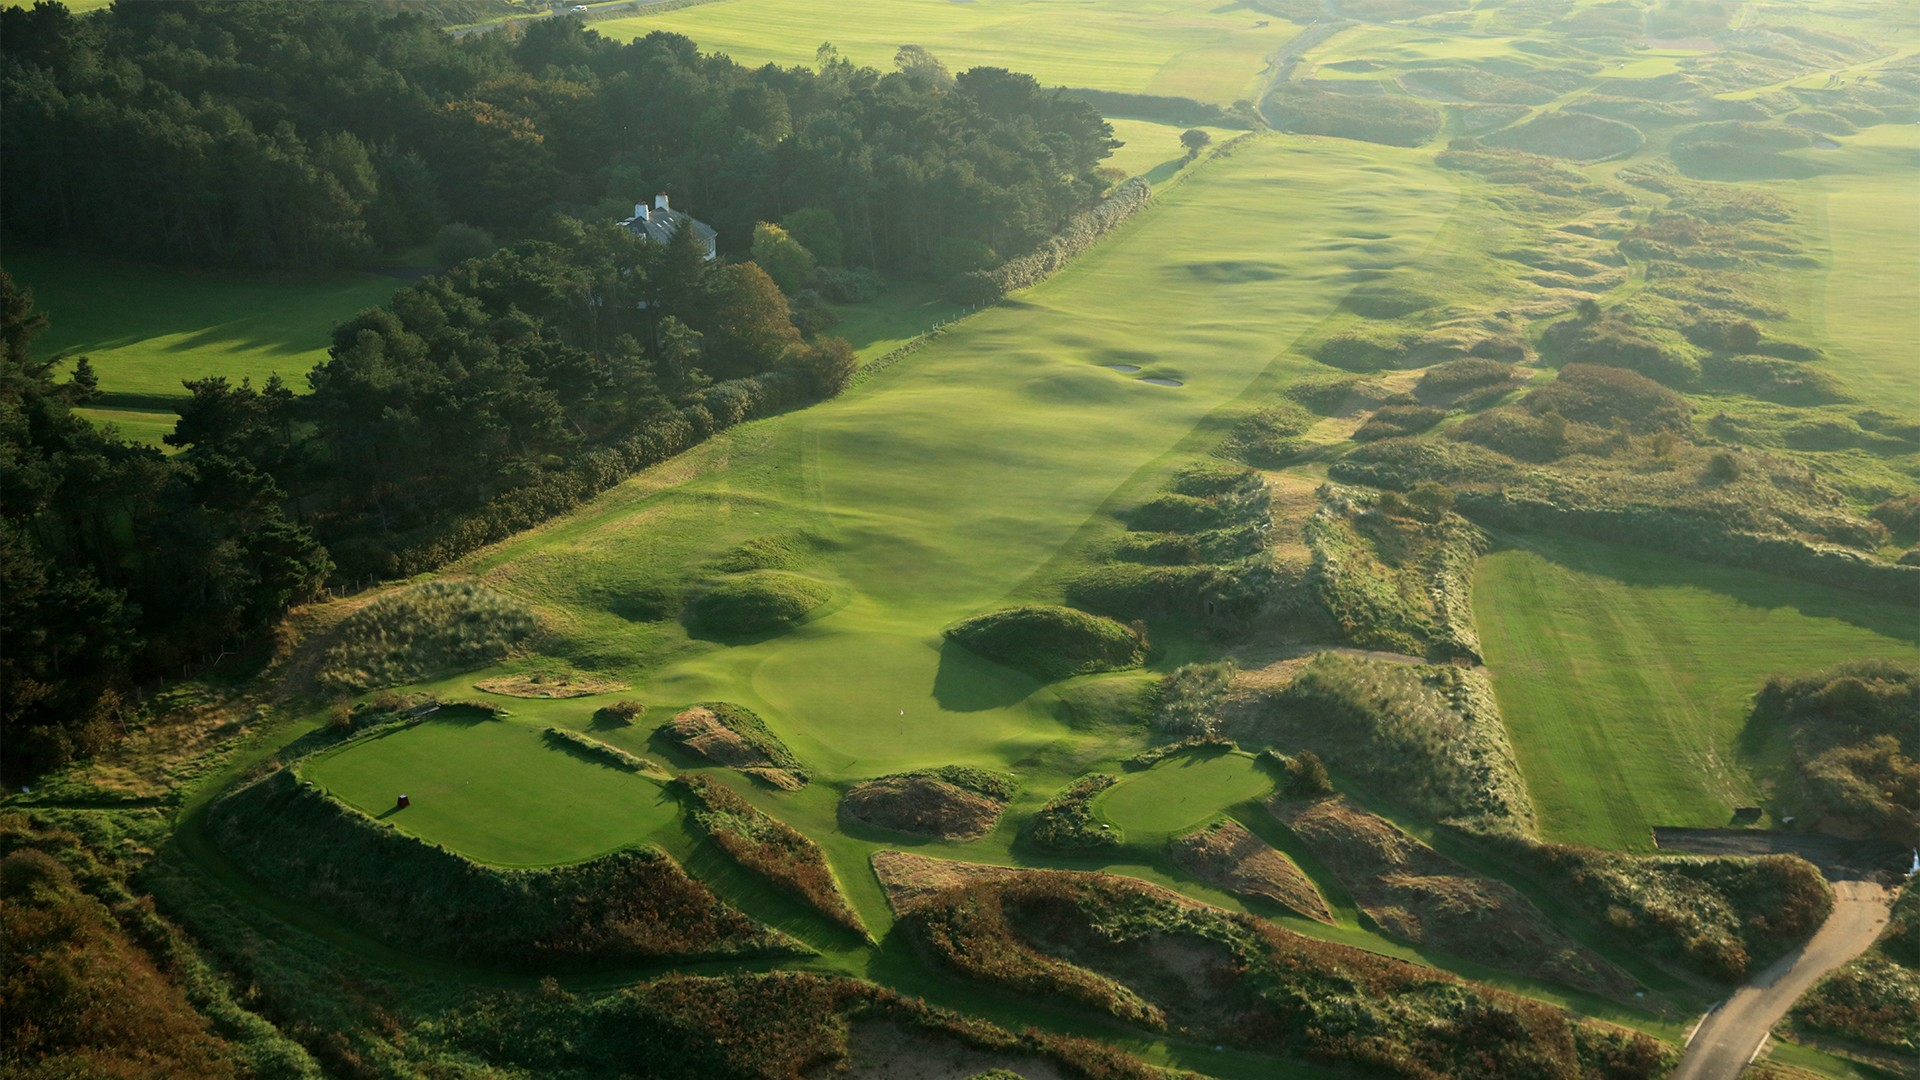 Royal Portrush, 4th hole, Dunluce Links golf course